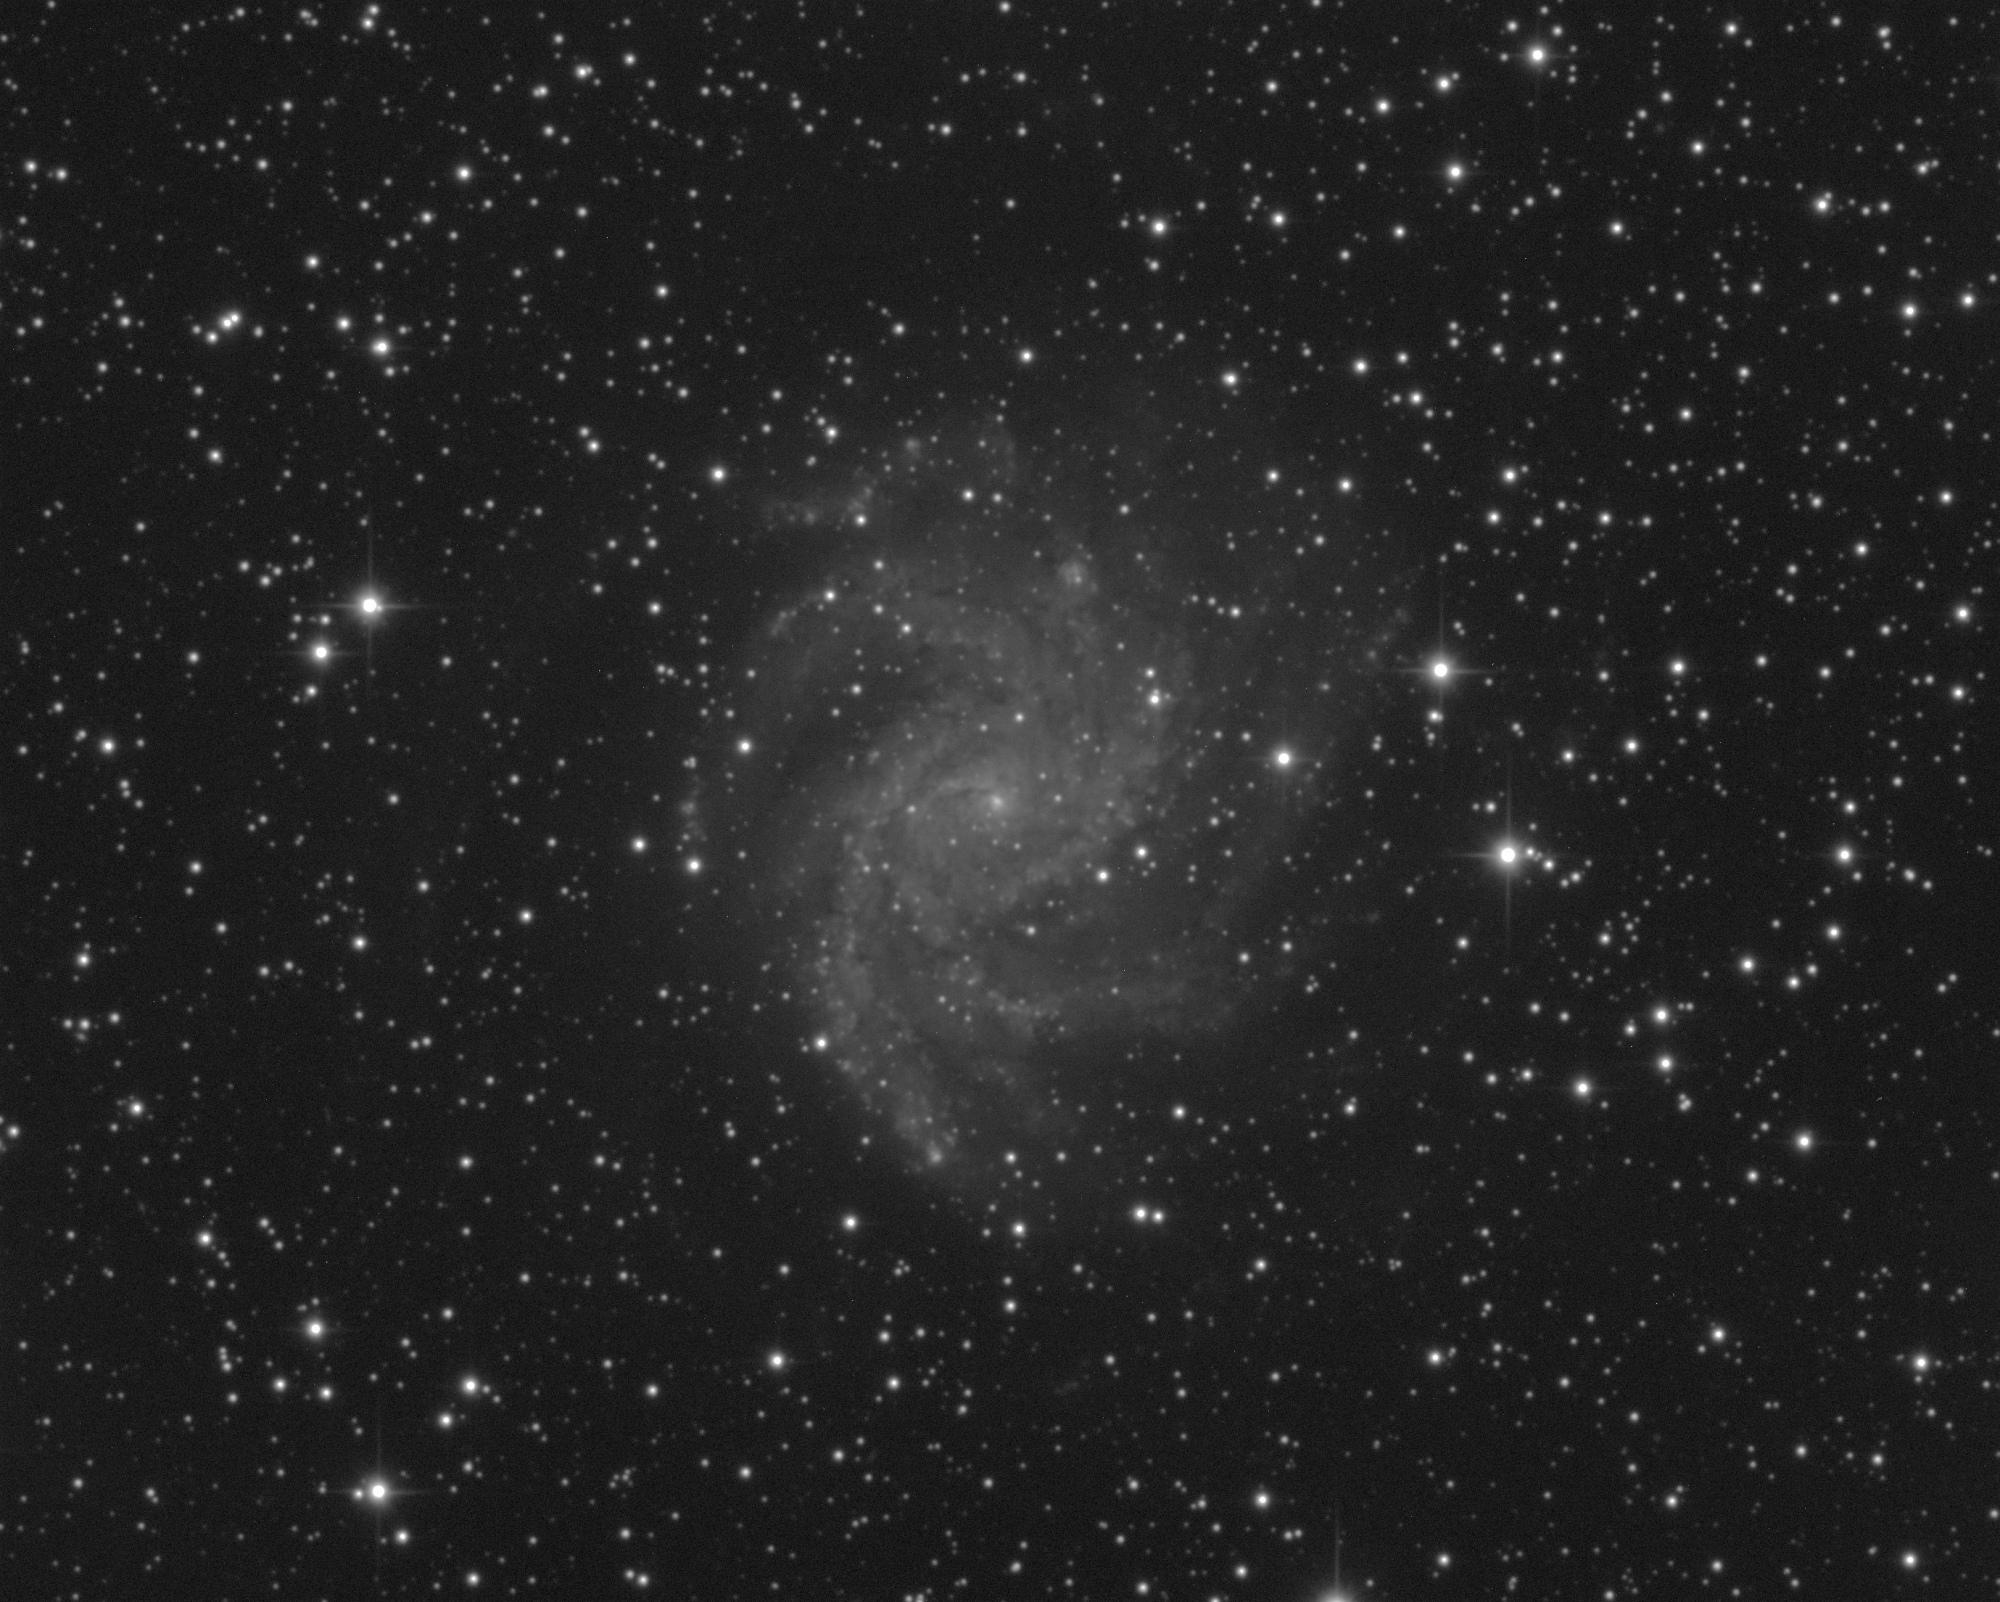 NGC6946_Light_Lum_1200s_1x1_W_-18.20458.jpg